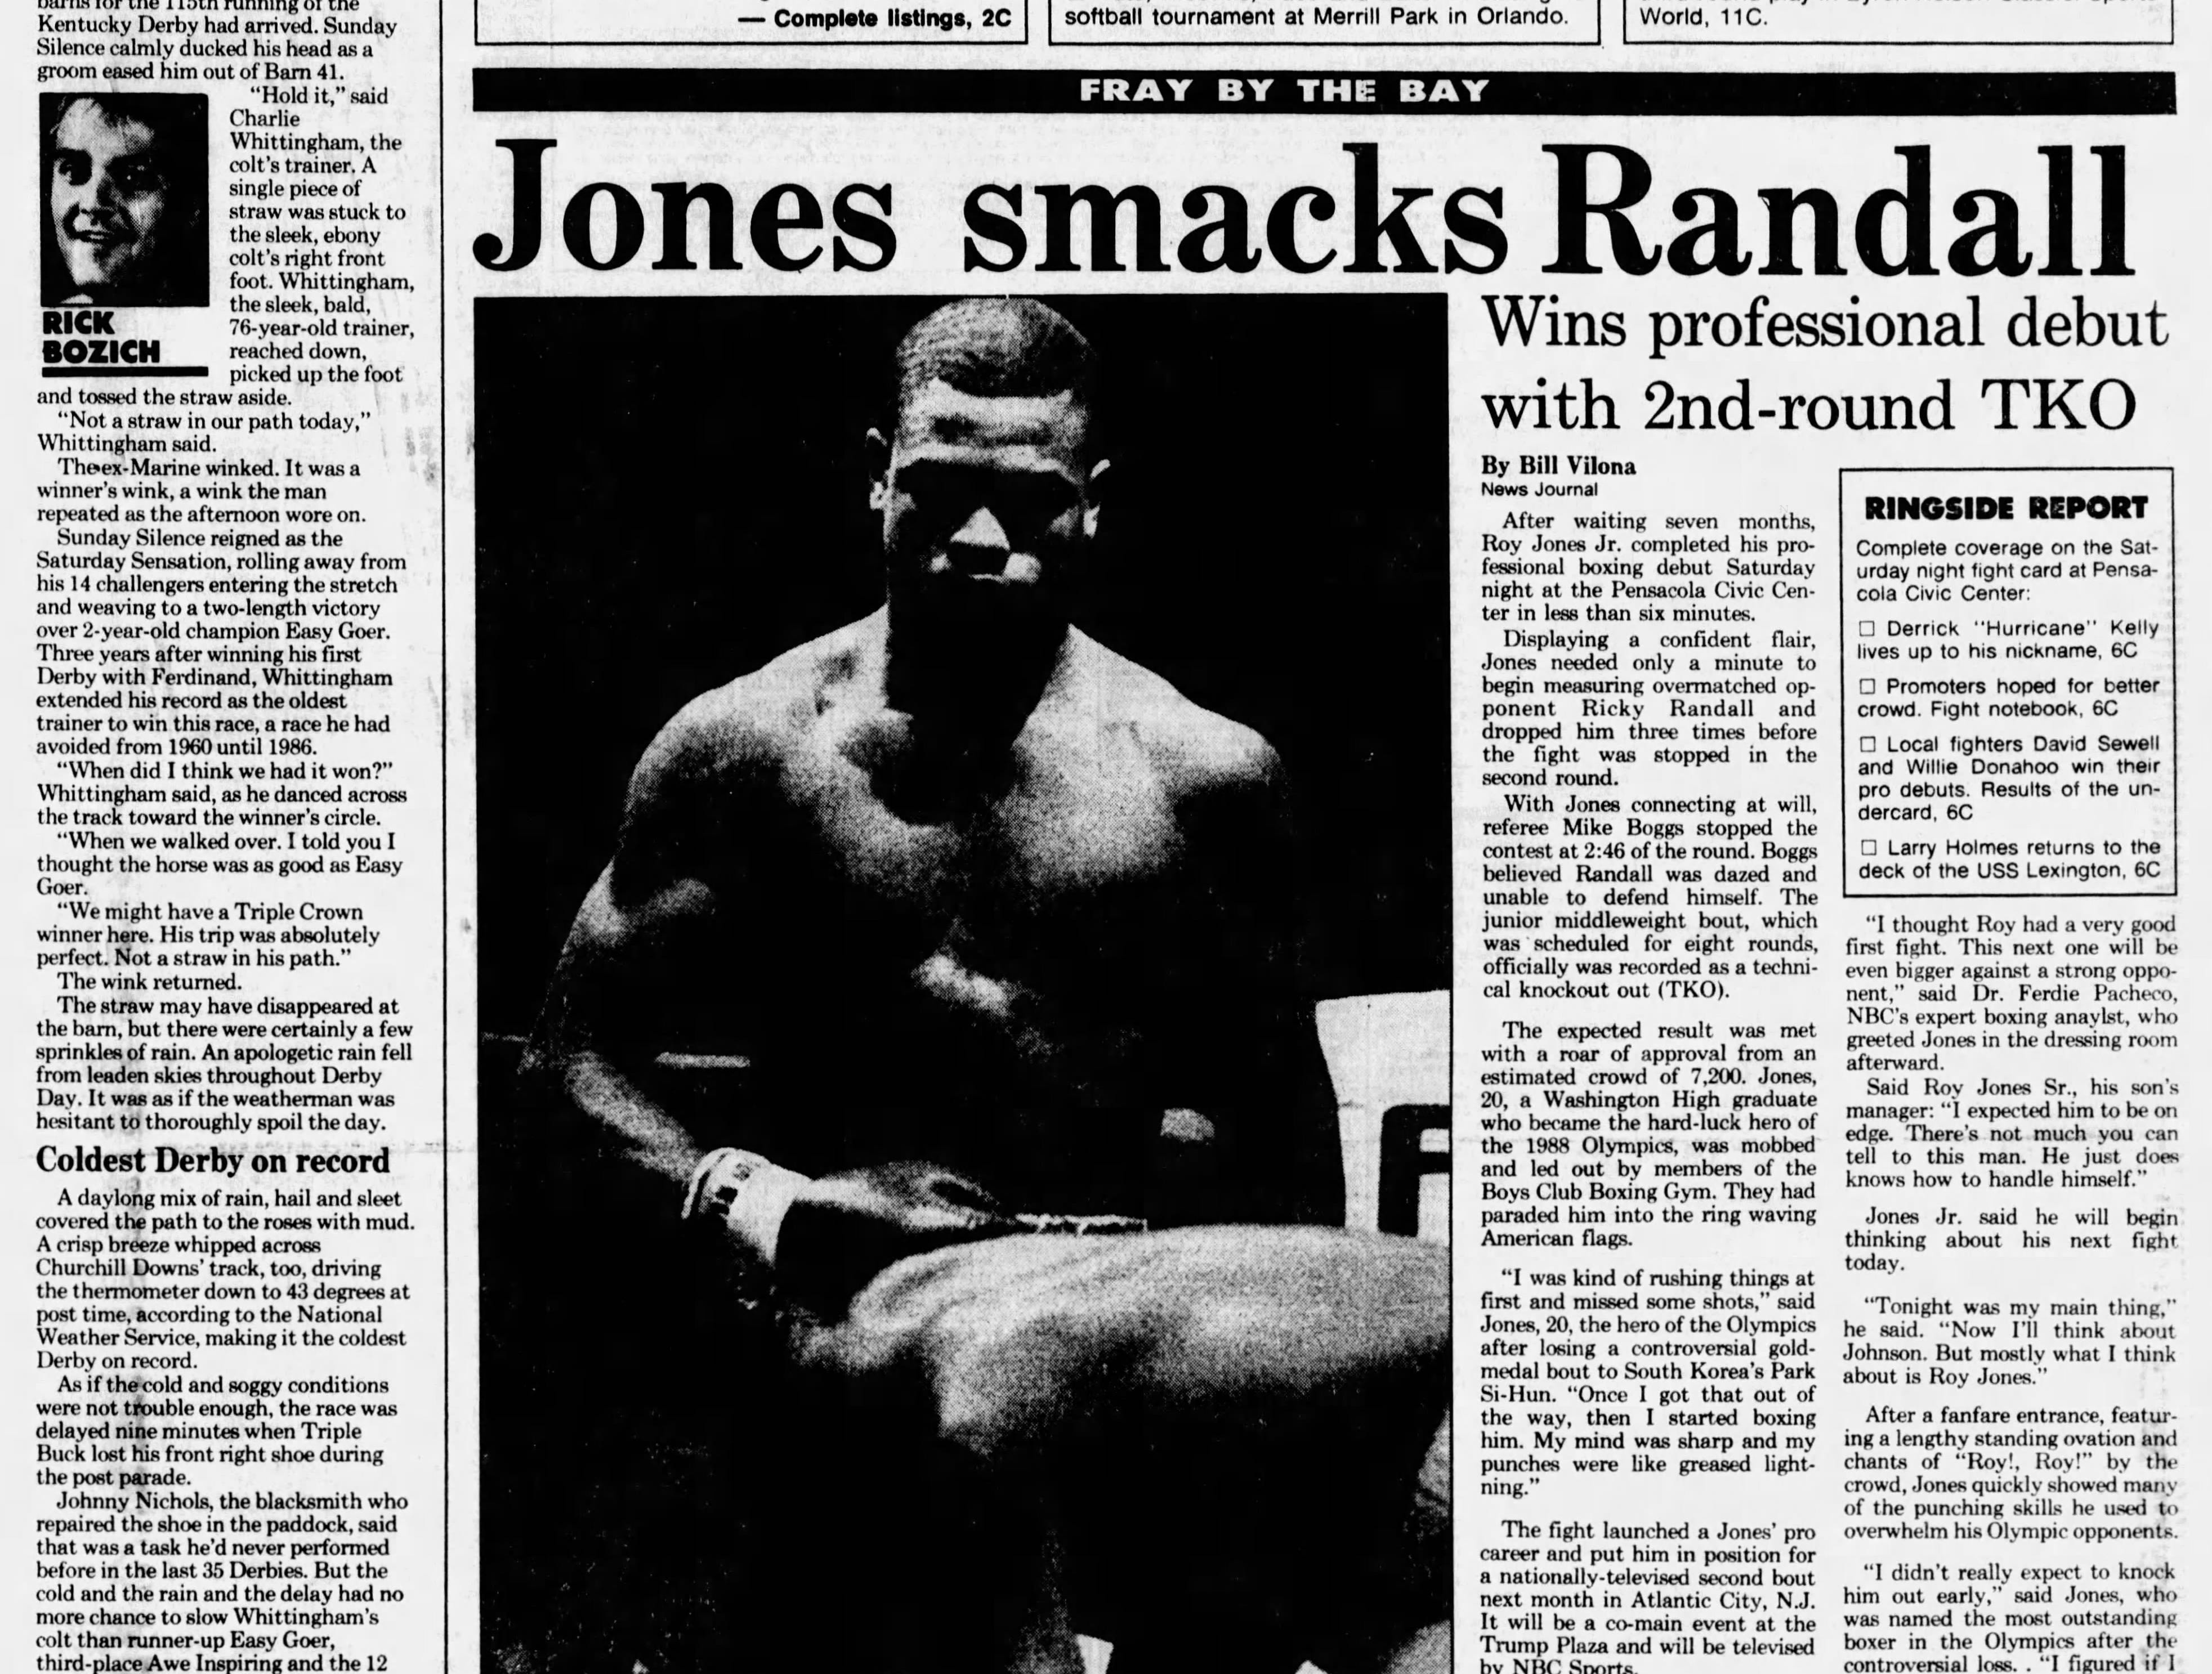 May 1989: Roy Jones Jr. makes pro boxing debut in Pensacola.